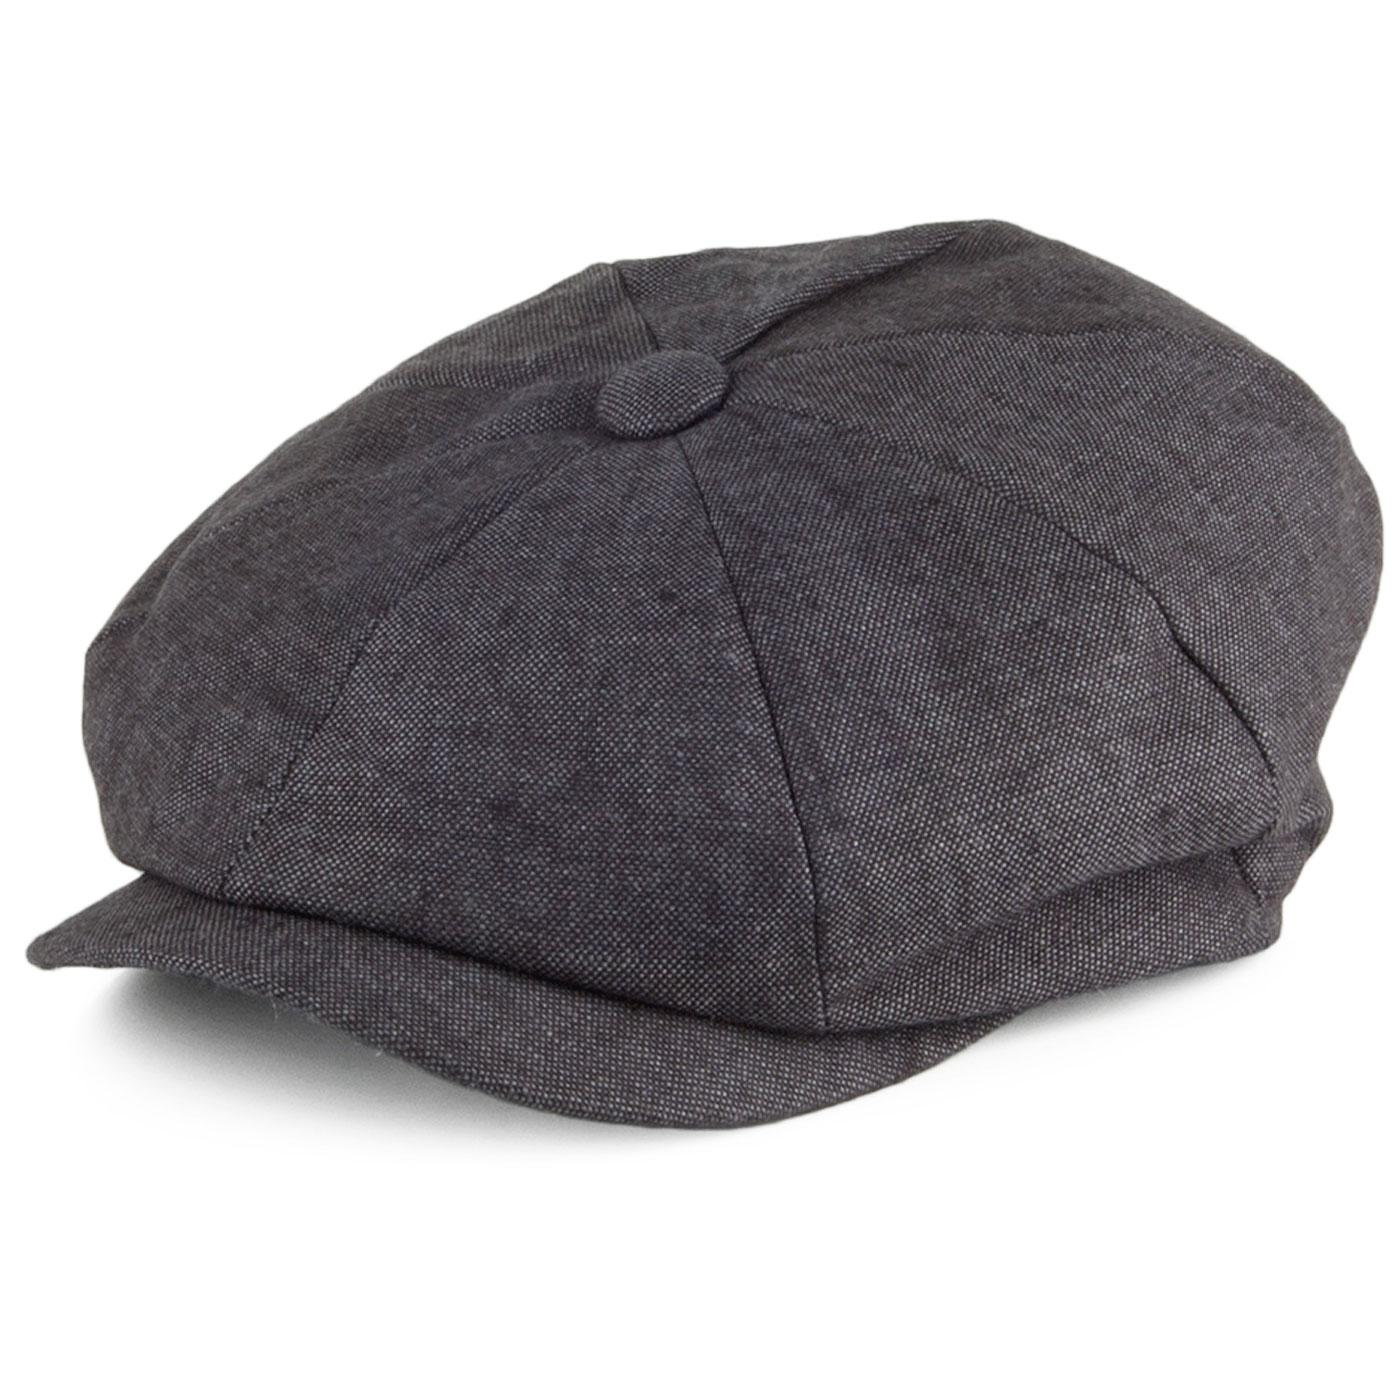 57380e99201 FAILSWORTH Men s Retro Irish Linen Gatsby Hat in Charcoal